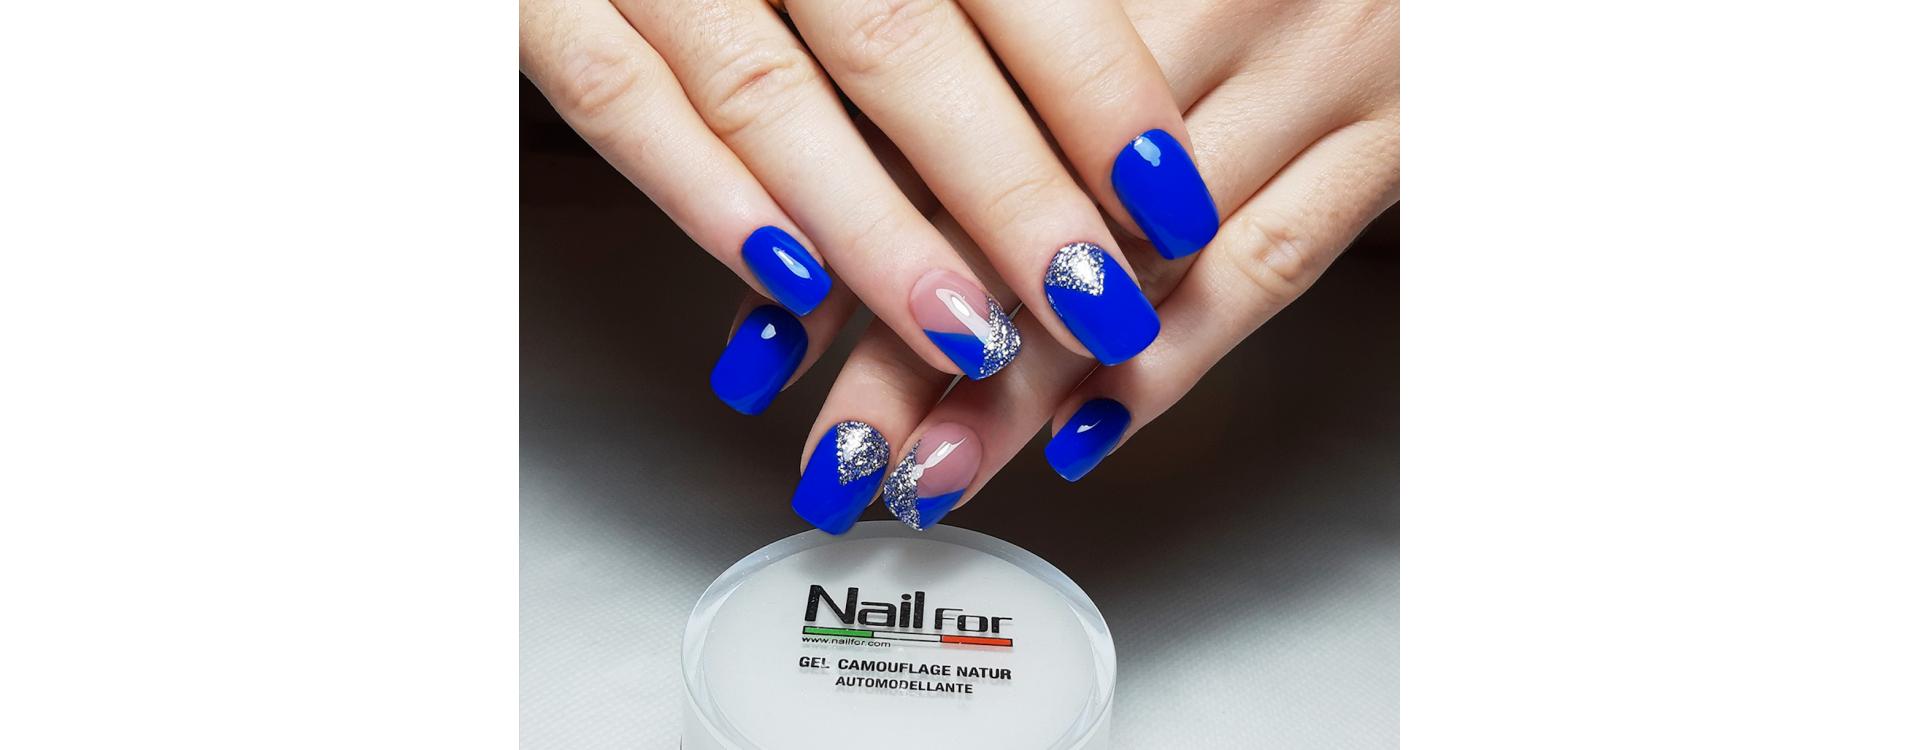 Favorito tendenze unghie per autunno inverno 2020 - Nailfor Business BY98